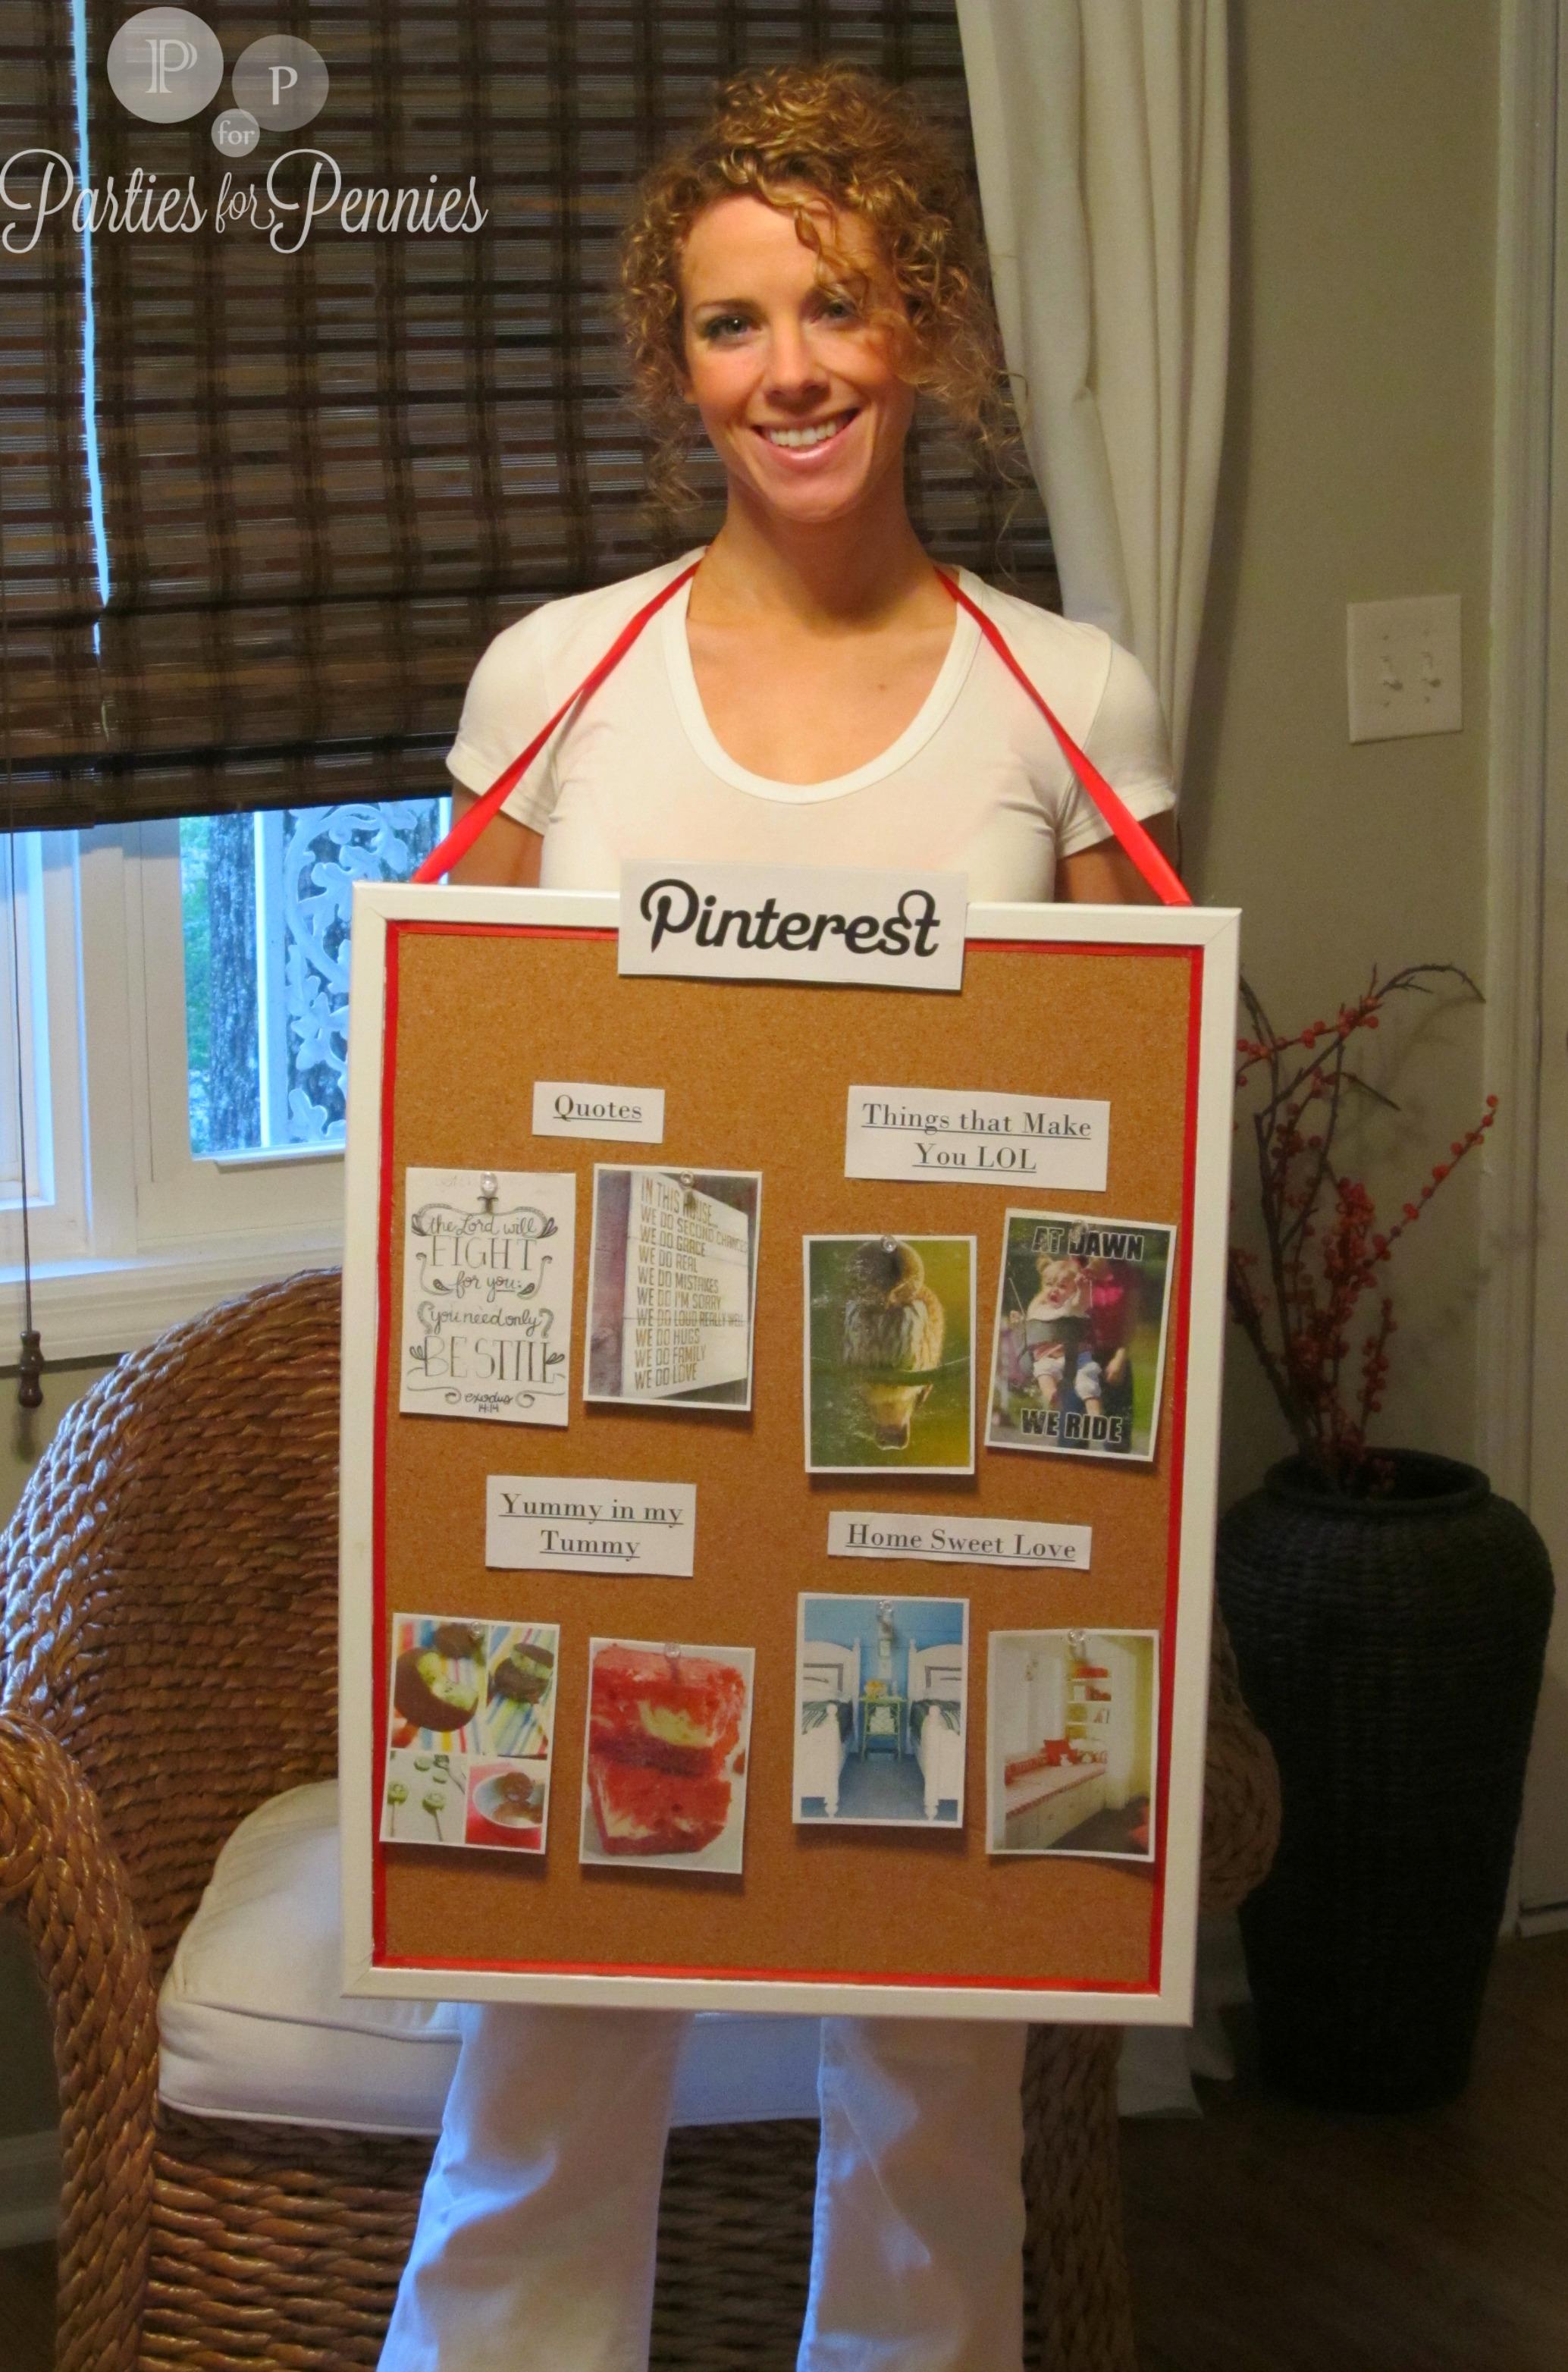 Halloween Costume Pinterest.Diy Halloween Costumes Throwback Thursday Parties For Pennies